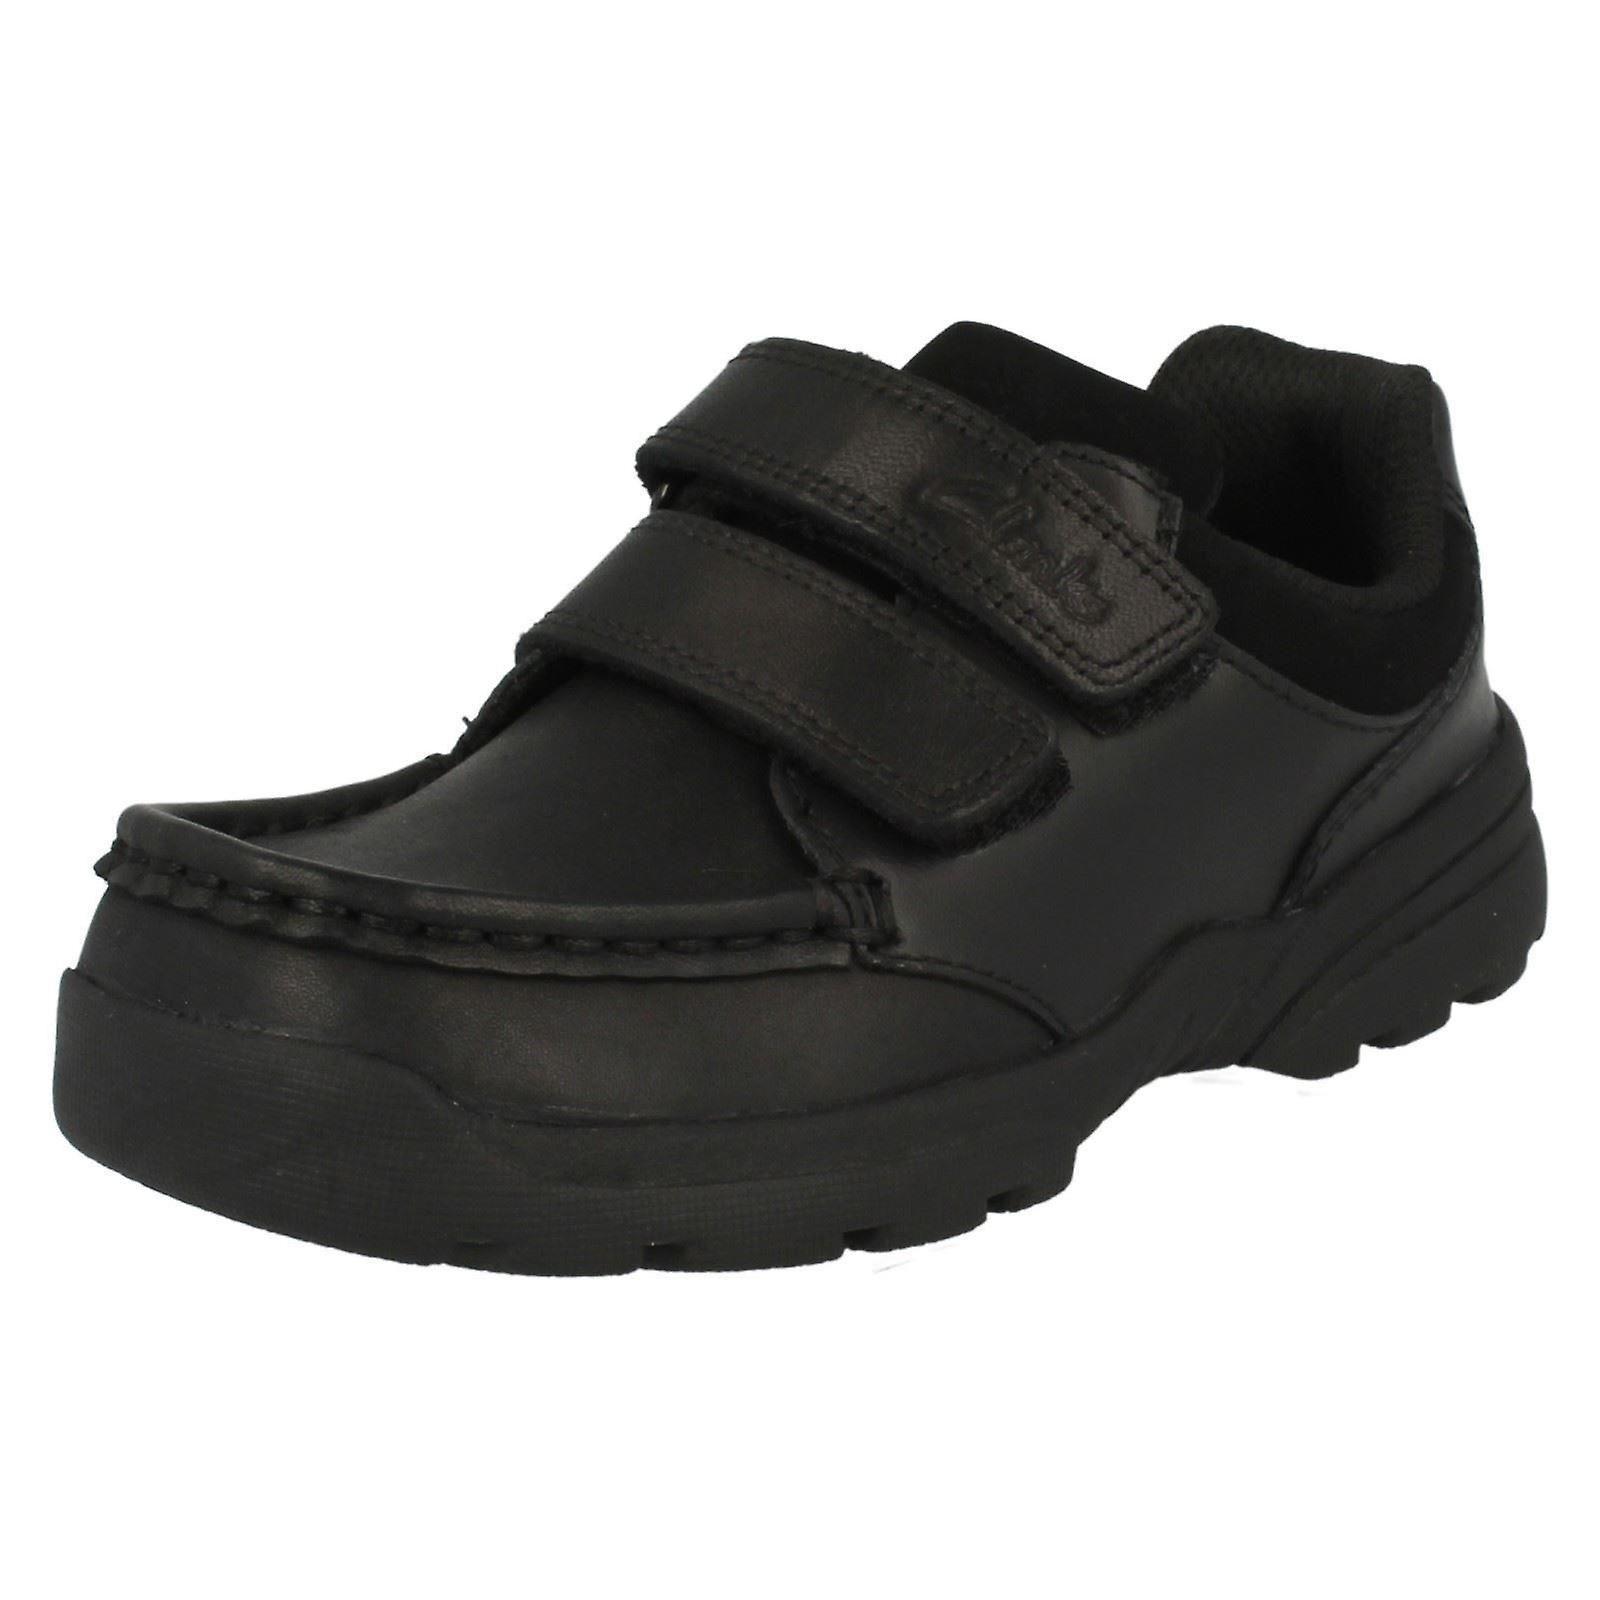 Boys Clarks Leather Shoes - Zayden Go Jnr